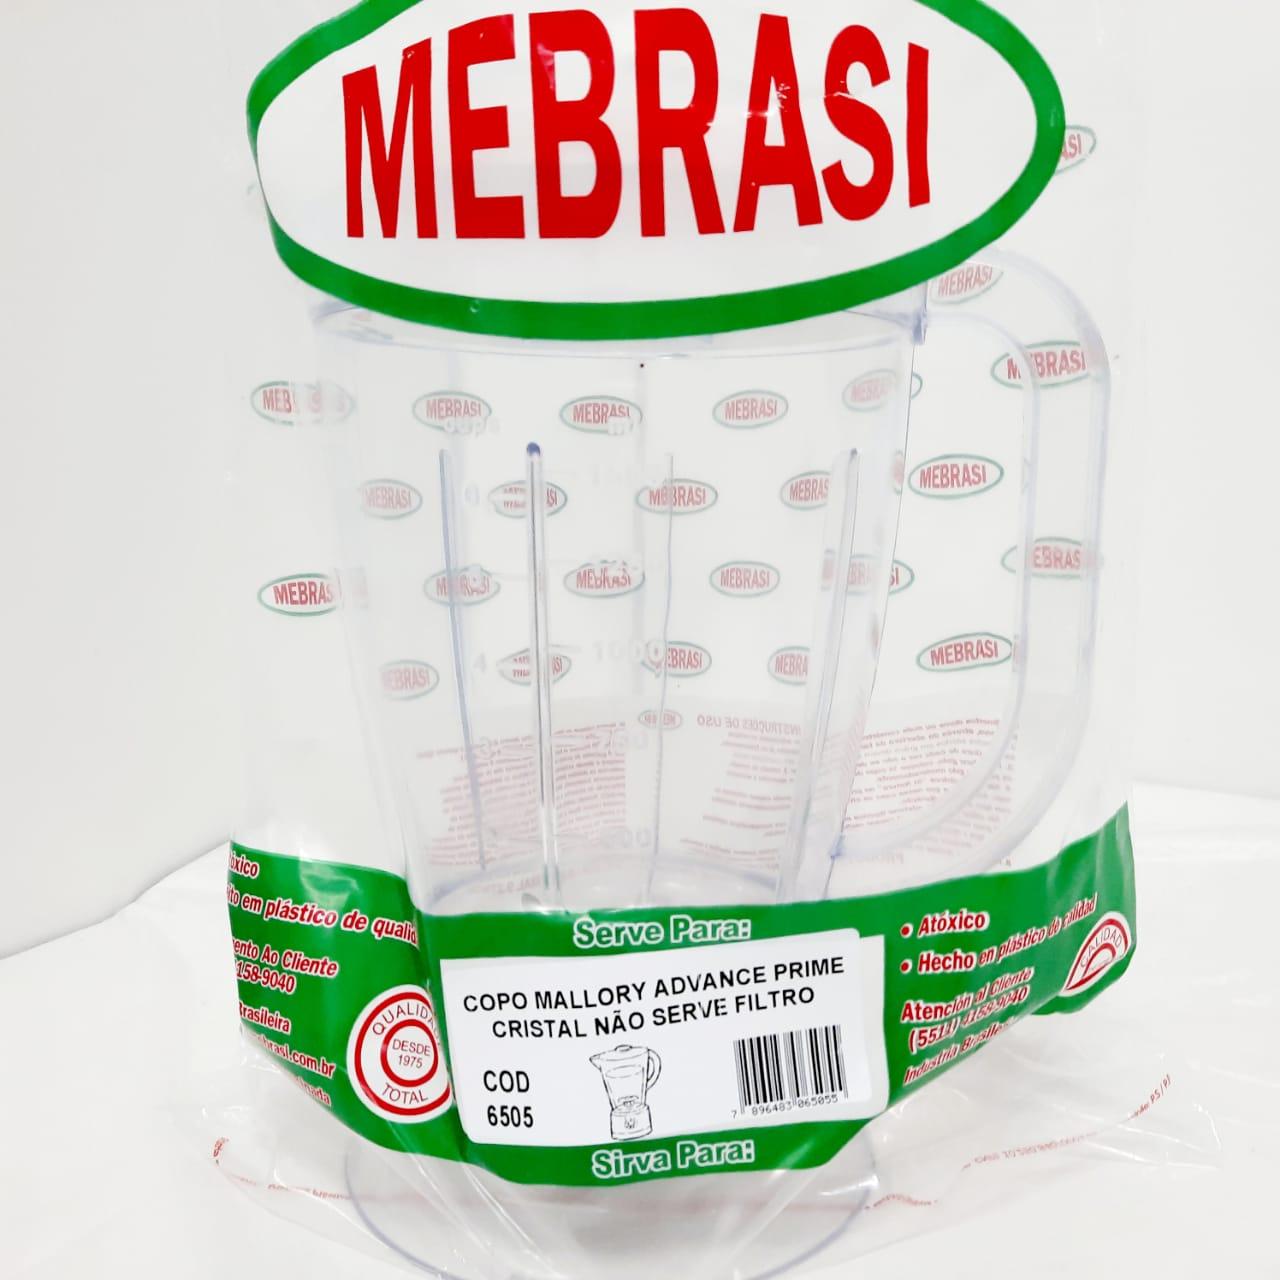 Copo Mallory Cristal ADV PRIM - Mebrasi